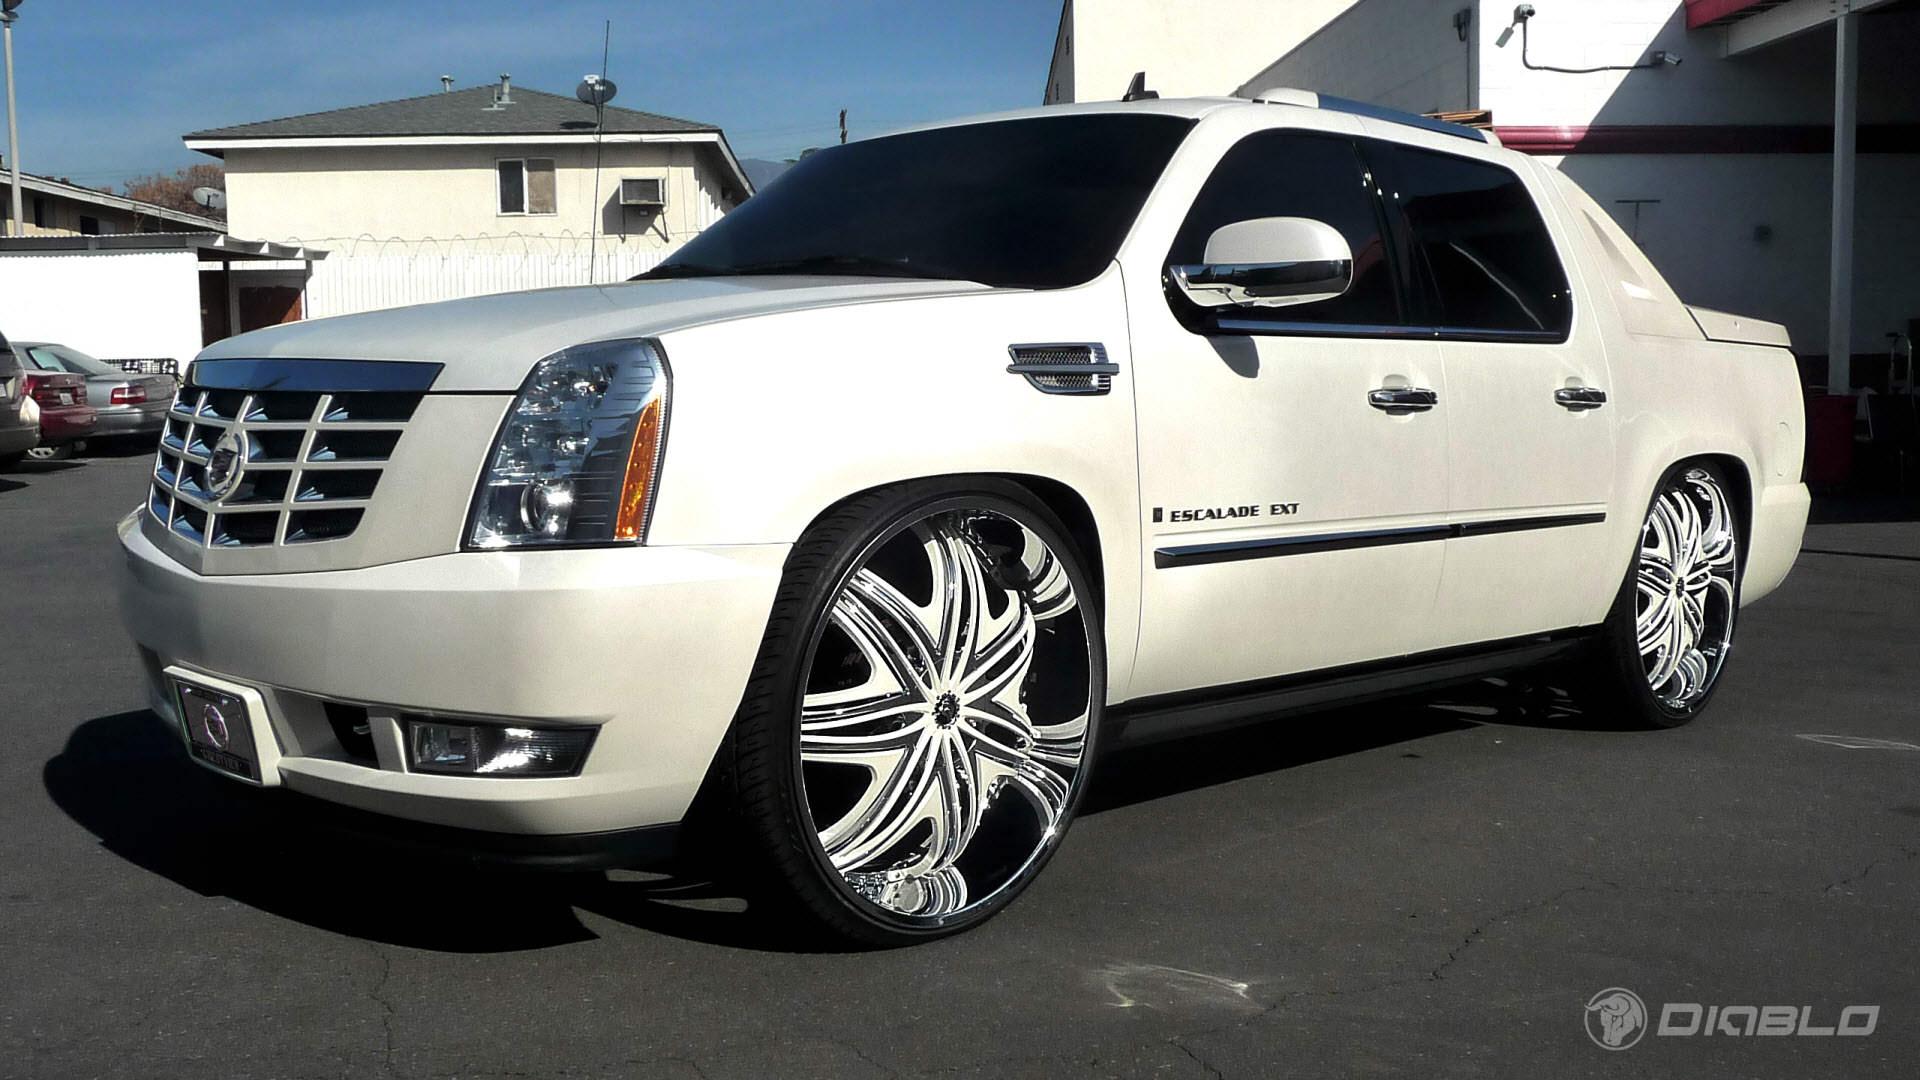 2010 Cadillac Escalade EXT On Diablo Wheels! NICE! A REAL ...